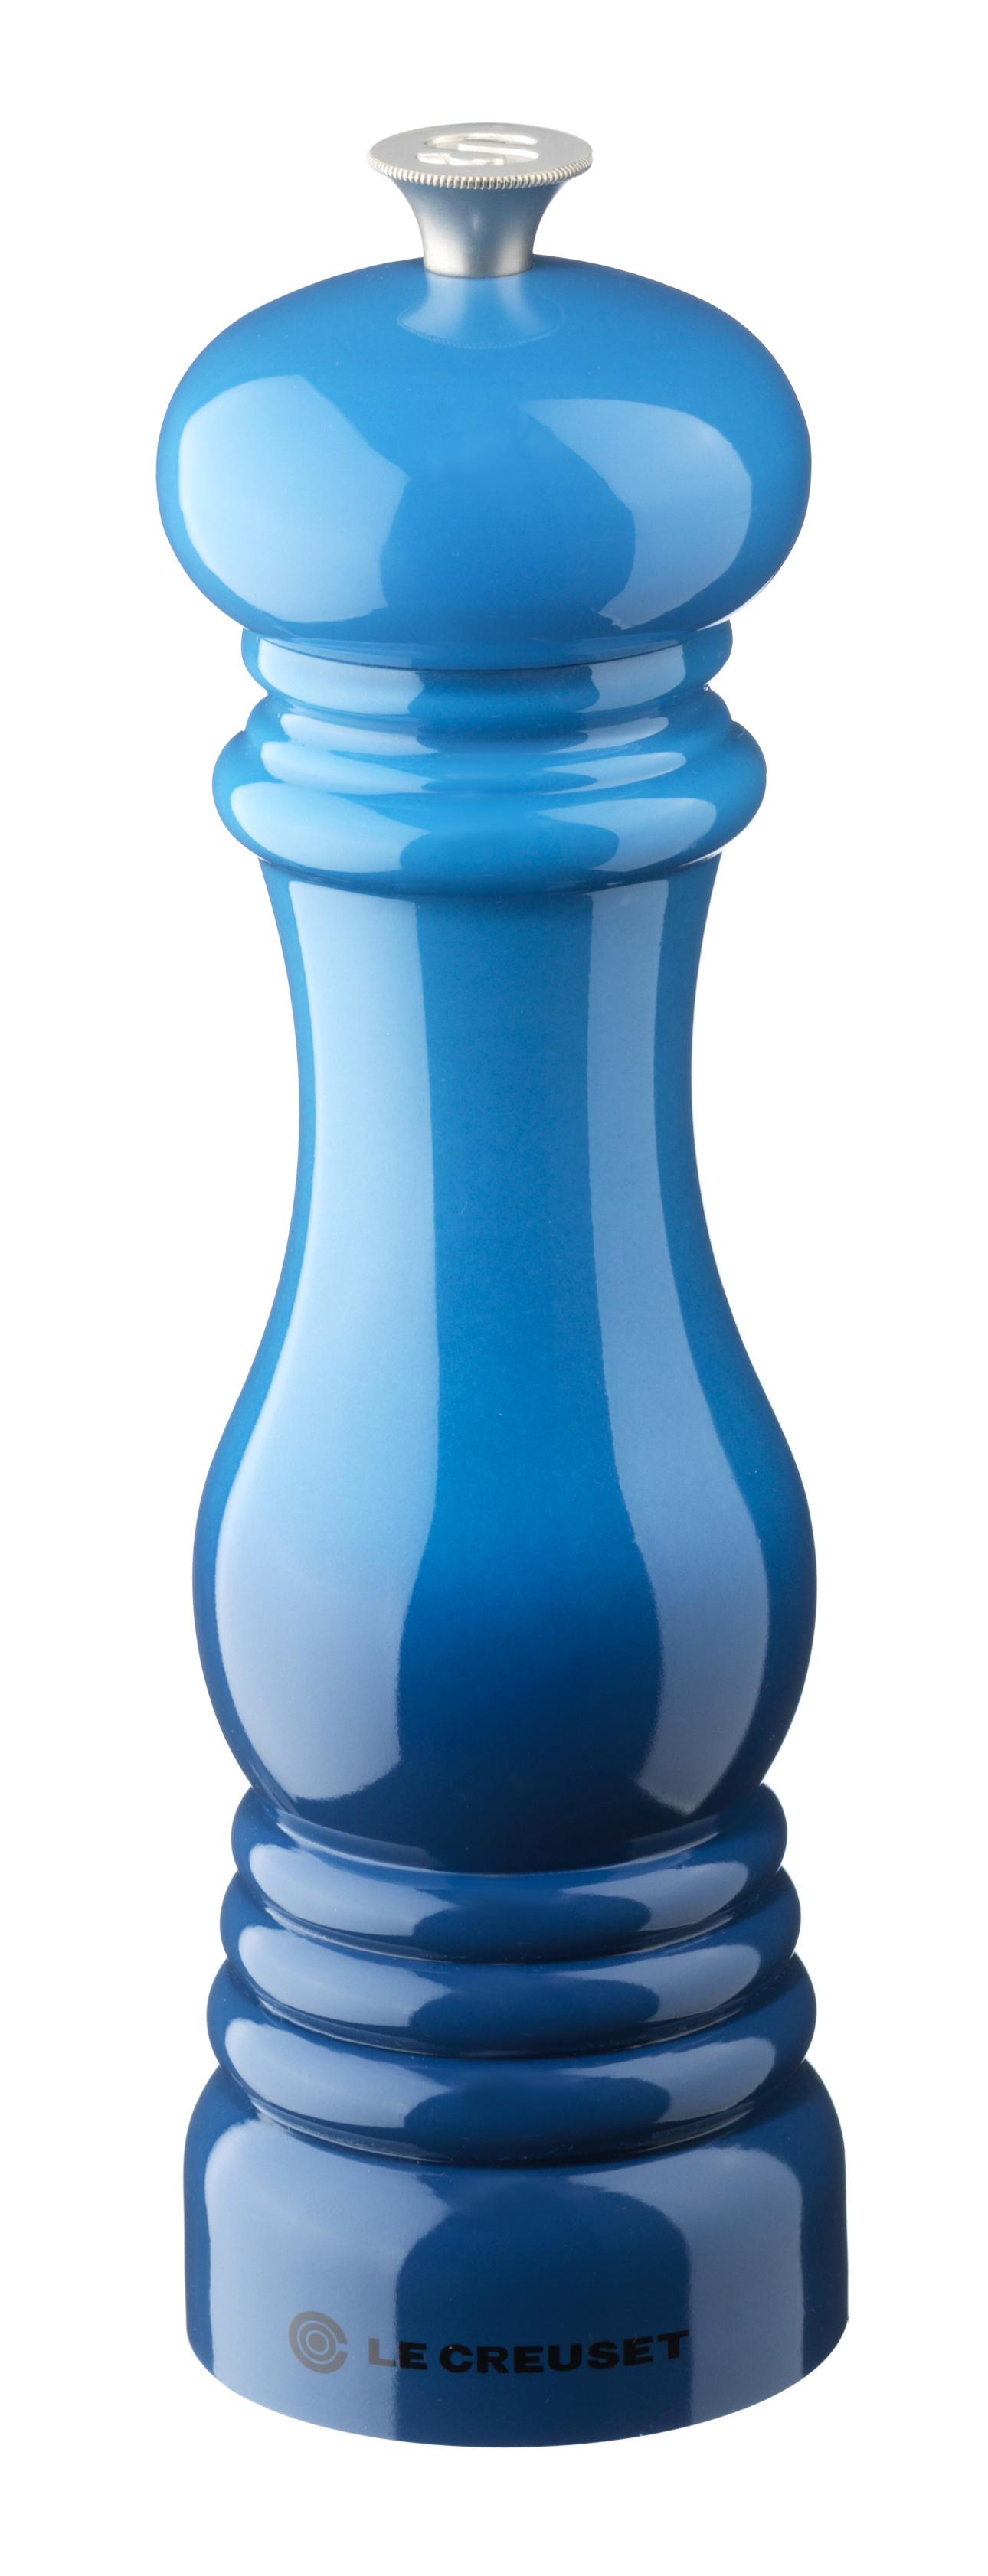 Le Creuset Pepparkvarn 21 cm Marseille